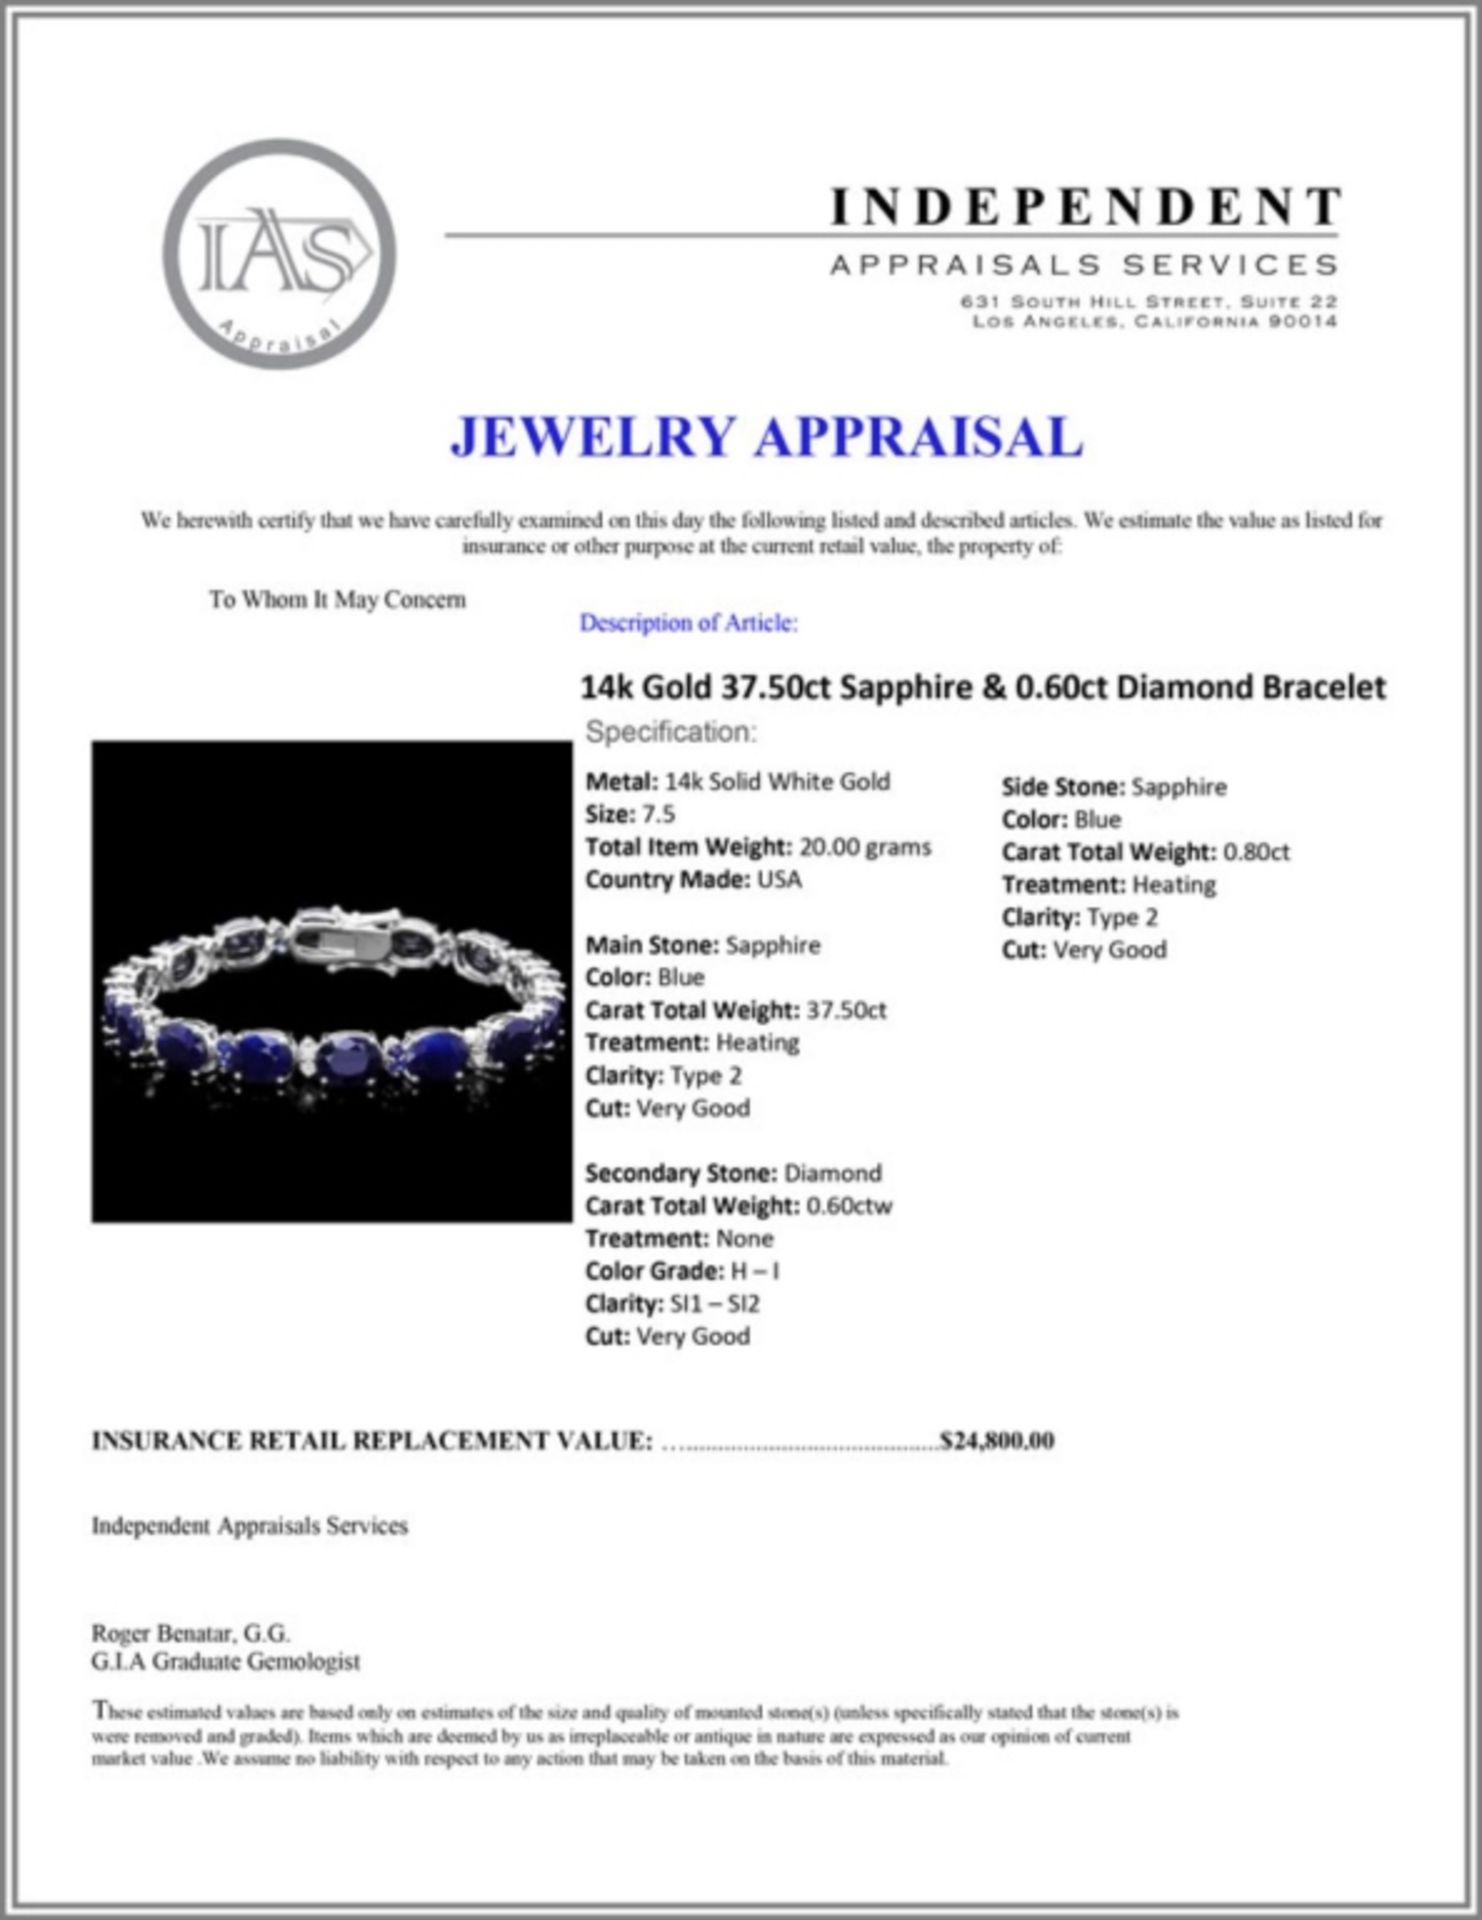 `14k Gold 37.50ct Sapphire & 0.60ct Diamond Bracel - Image 3 of 3